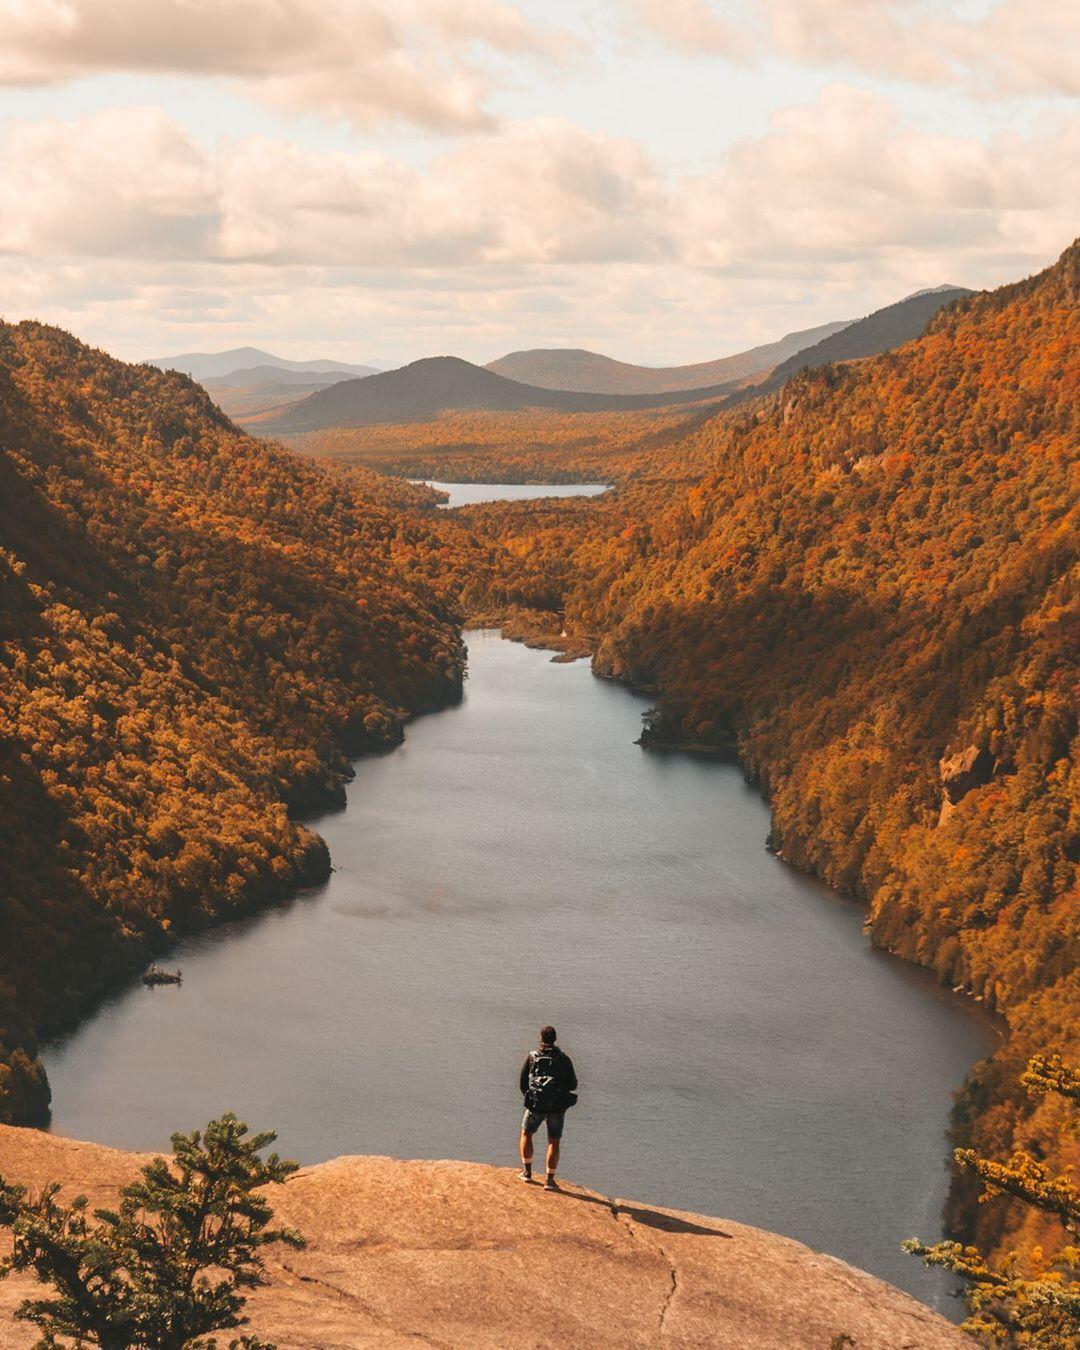 Indian Head Mountain in the Adirondacks high peak region